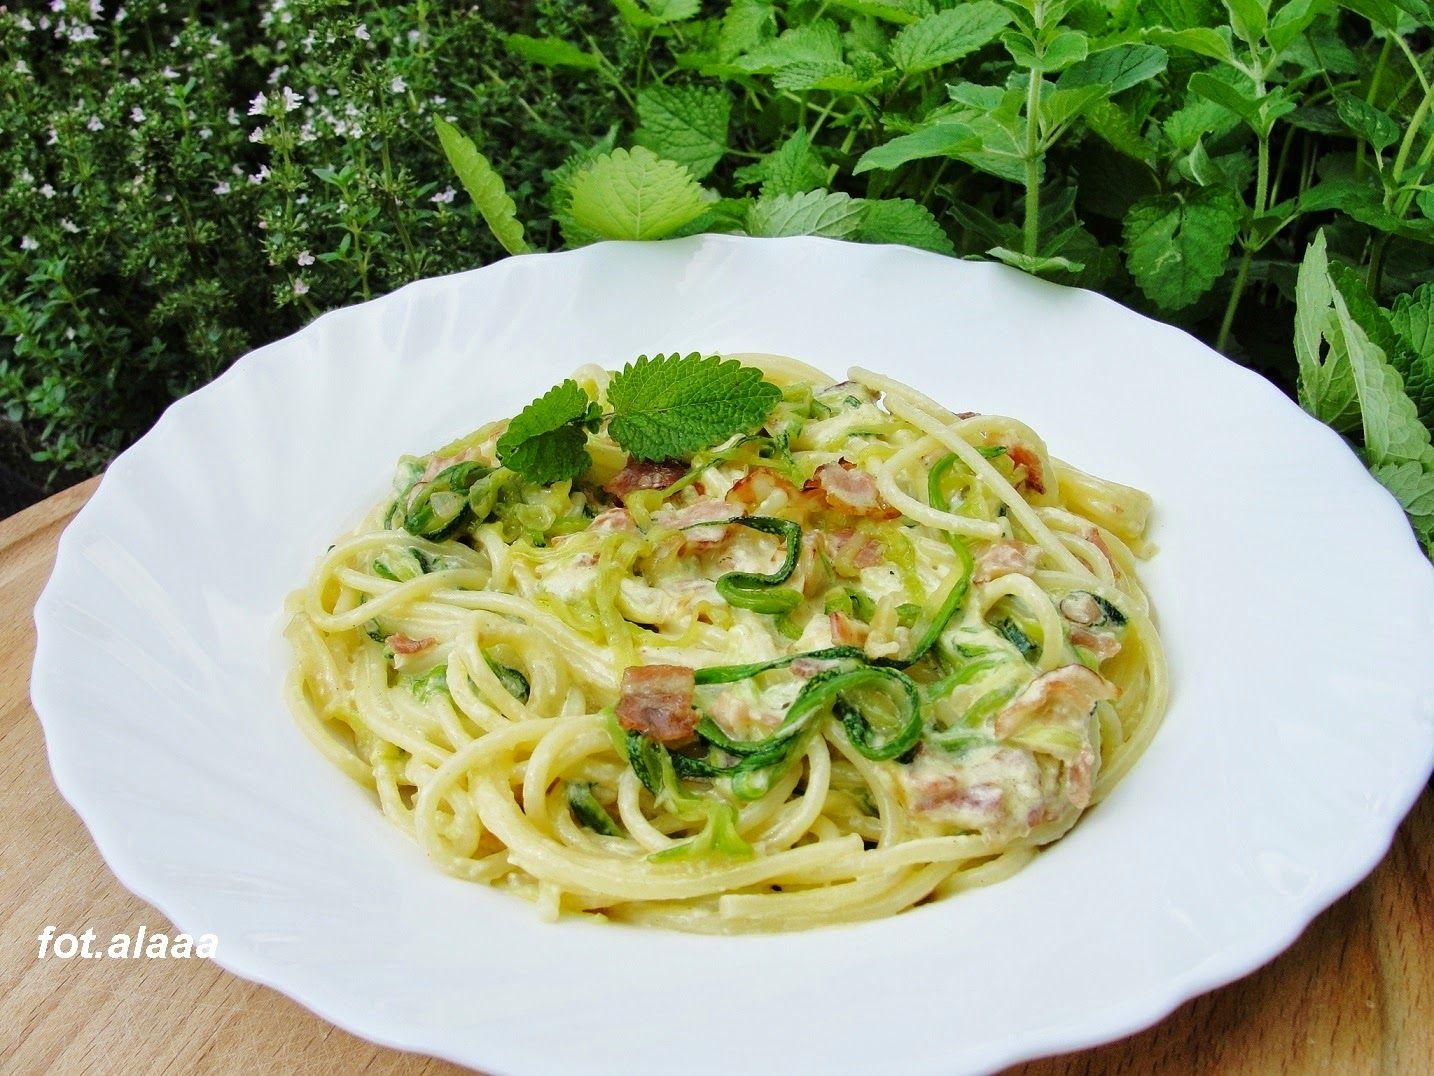 Spaghetti Z Cukinia Ala Carbonara Carbonara Spaghetti Cooking